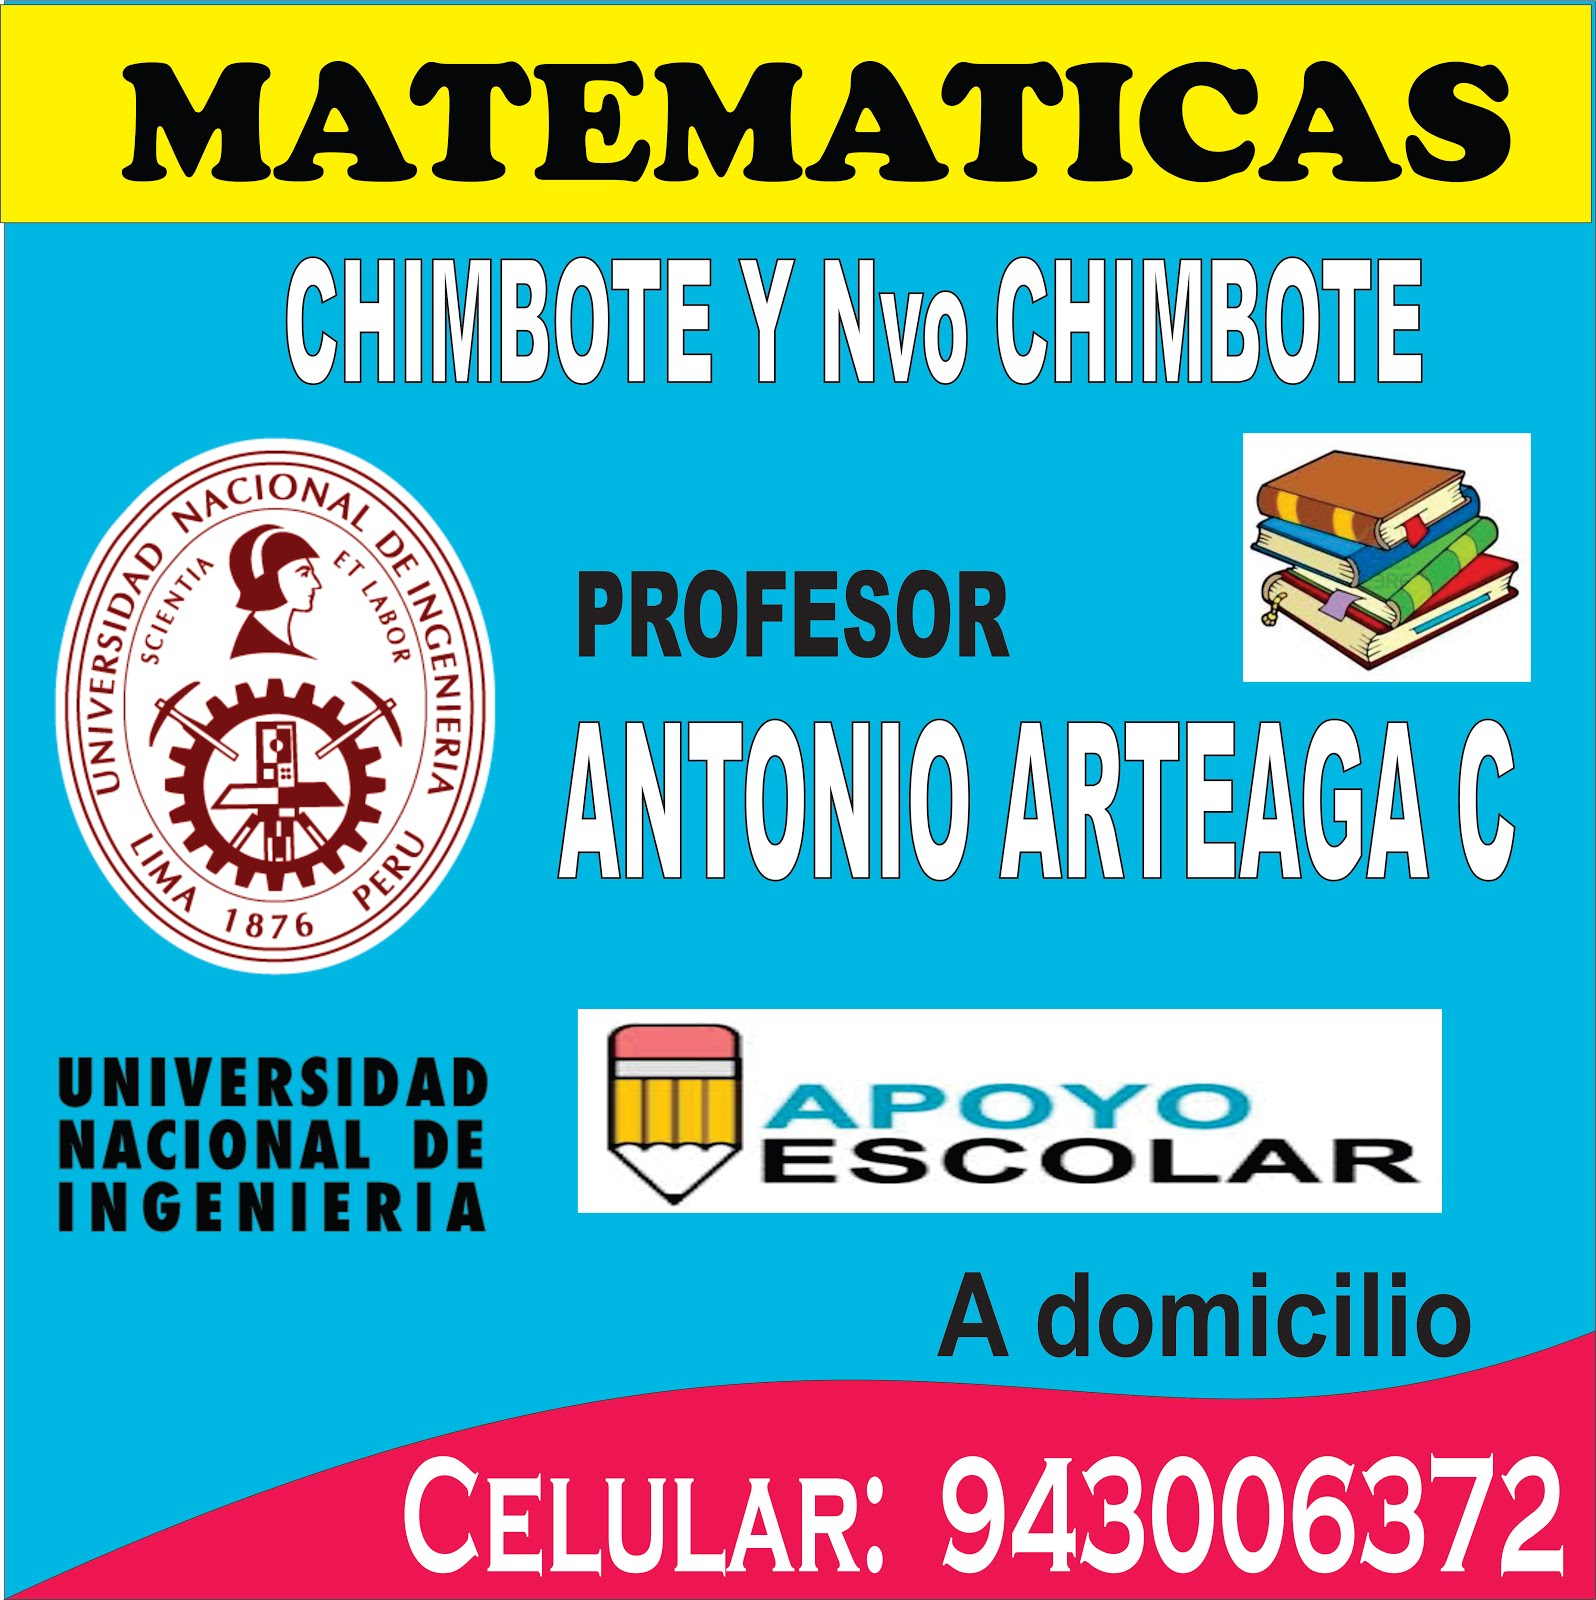 PROFESOR DE MATEMATICAS EN CHIMBOTE